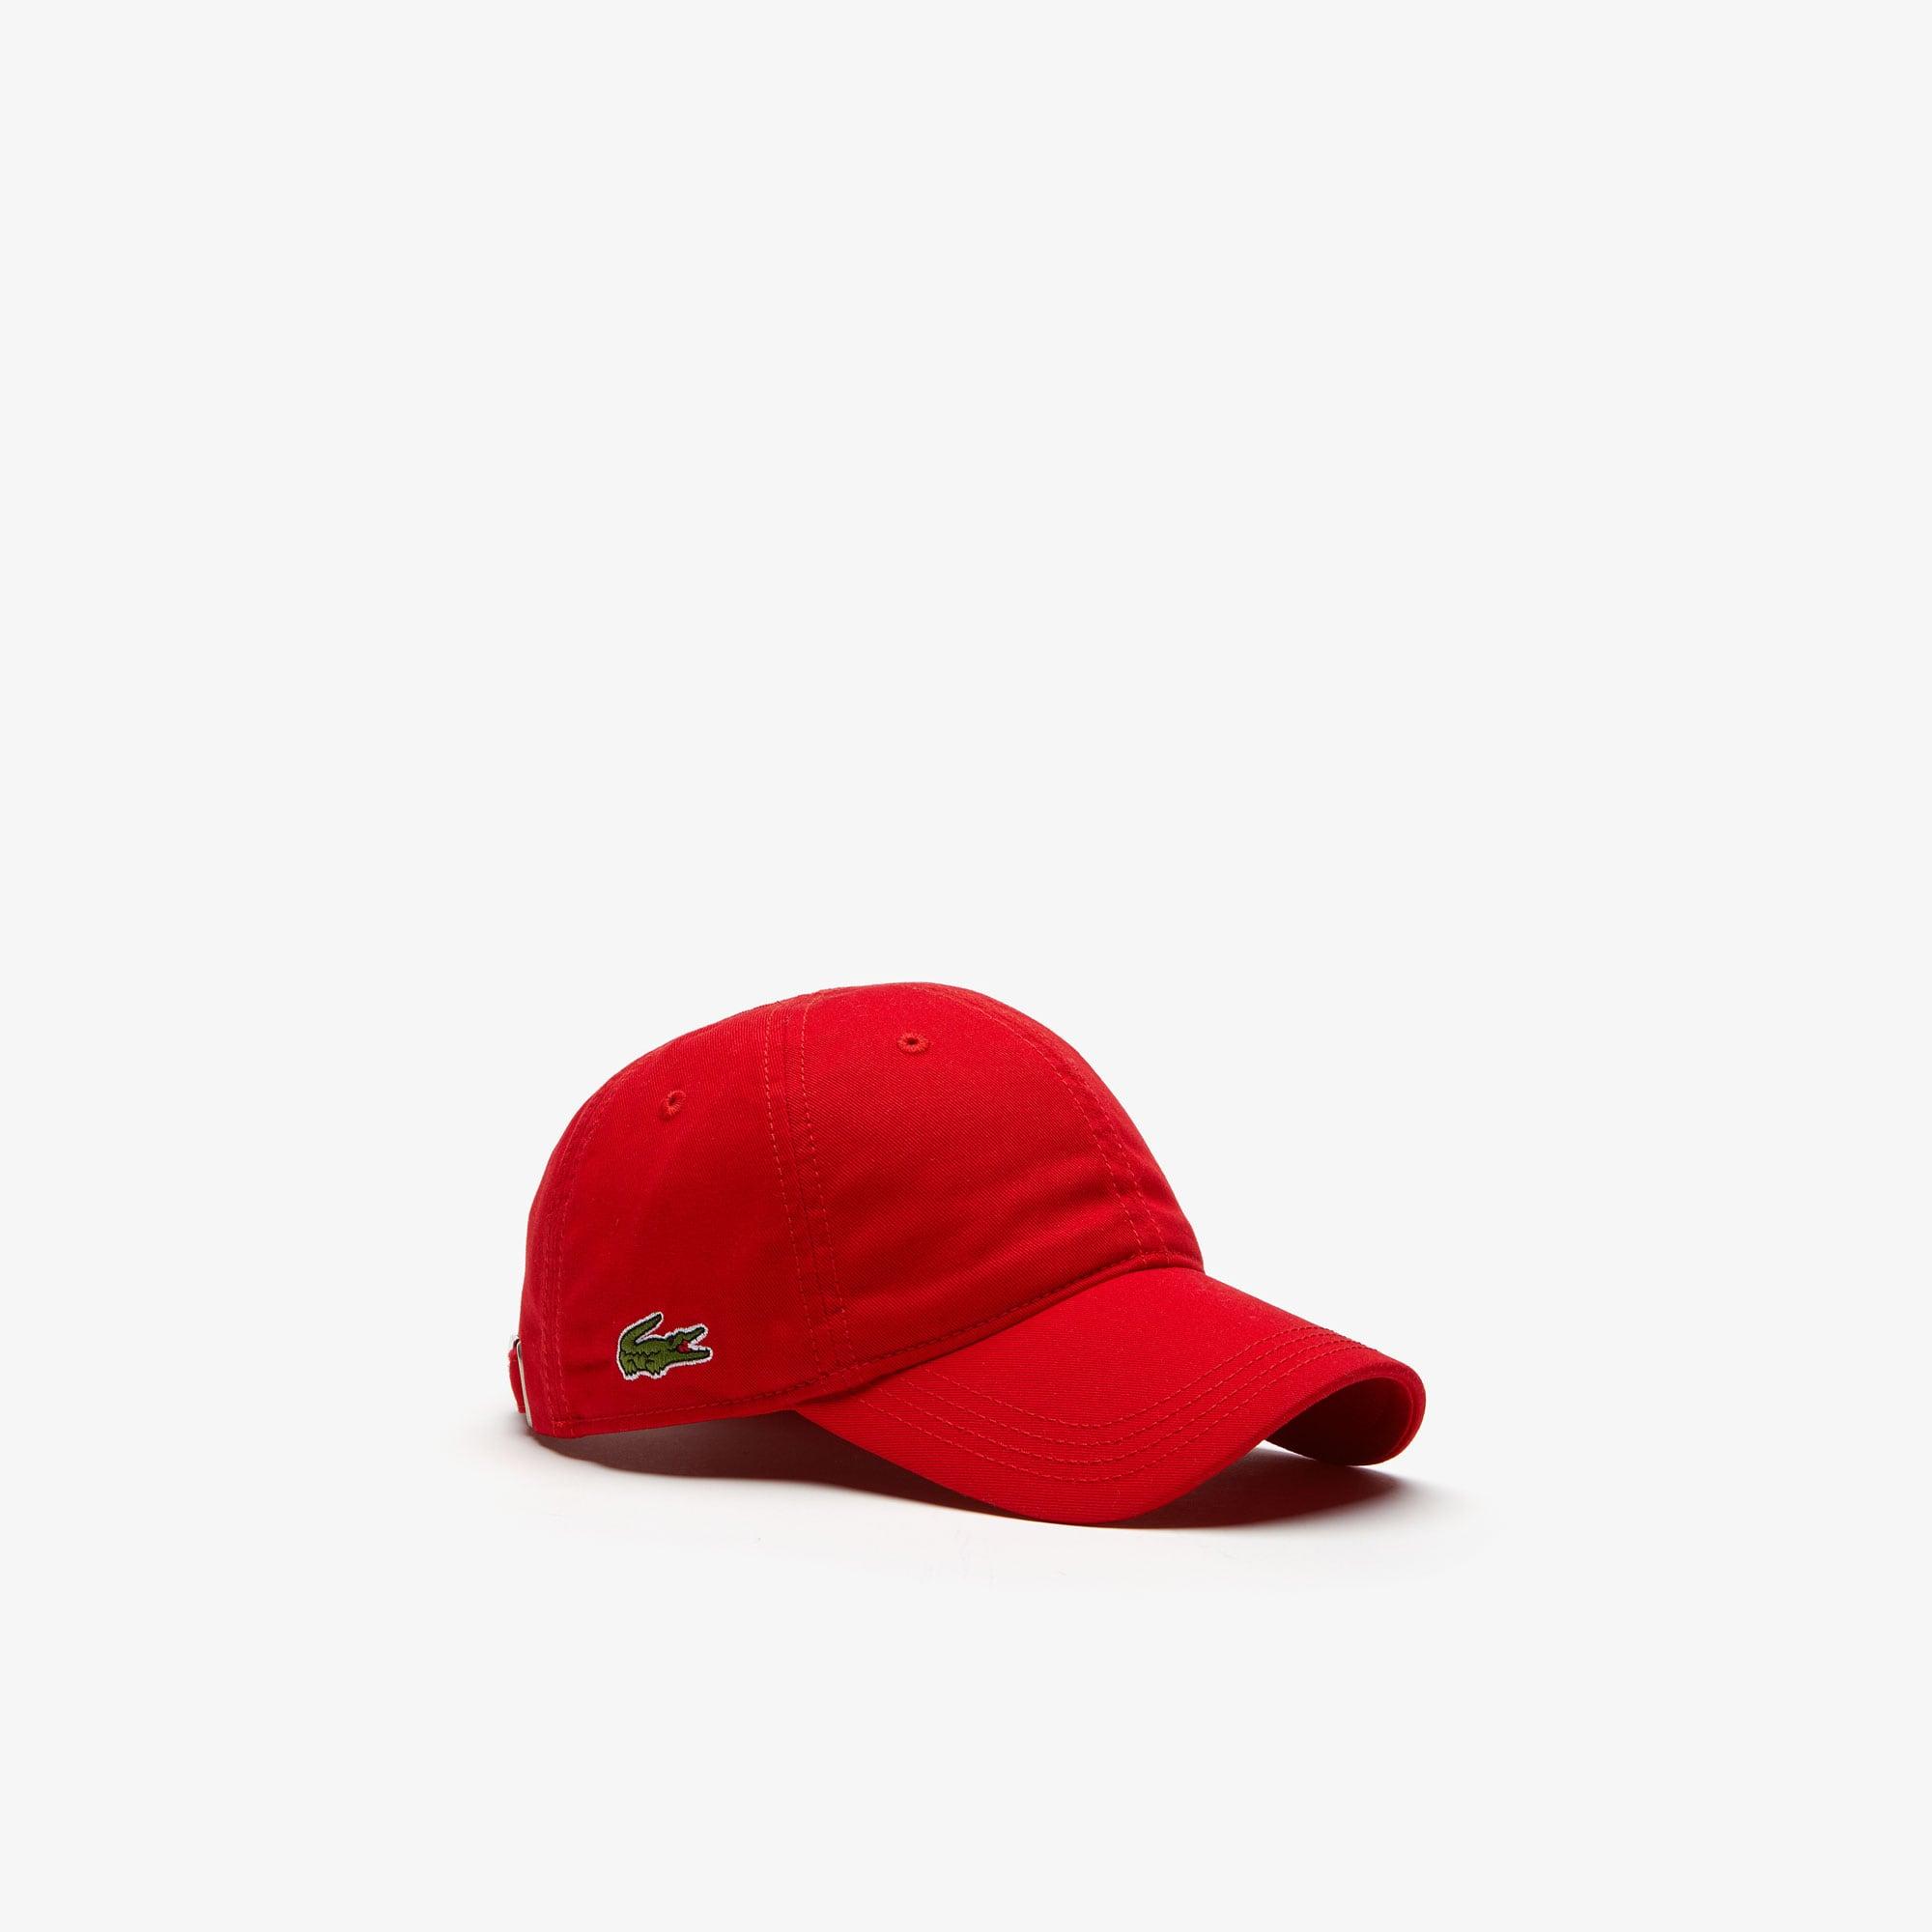 b0cc3ce6e Caps & Hats | Men's Accessories | LACOSTE